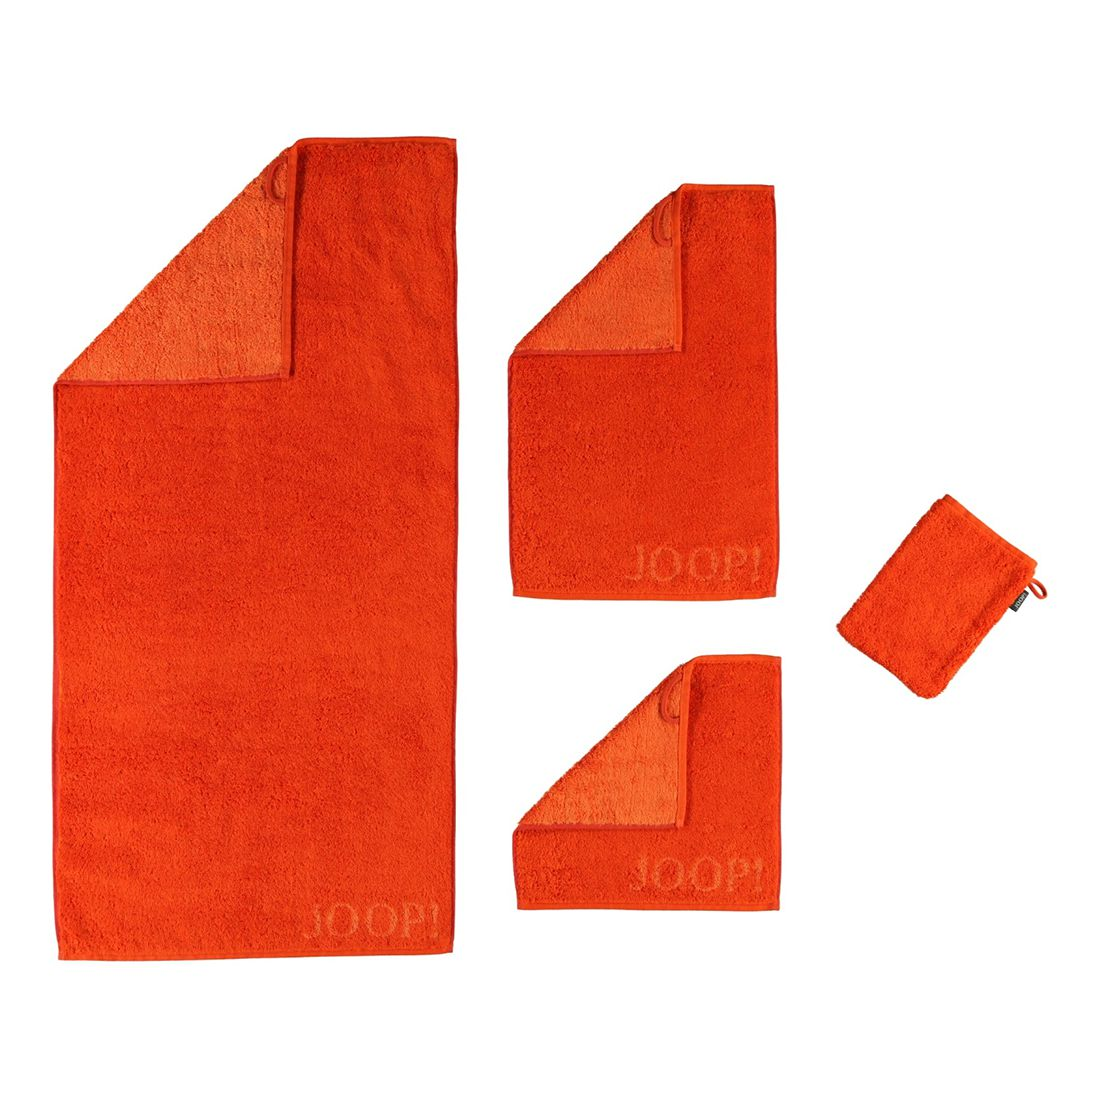 Handtuch Classic Doubleface – 100% Baumwolle papaya – 23 – Waschhandschuh: 16 x 22 cm, Joop günstig